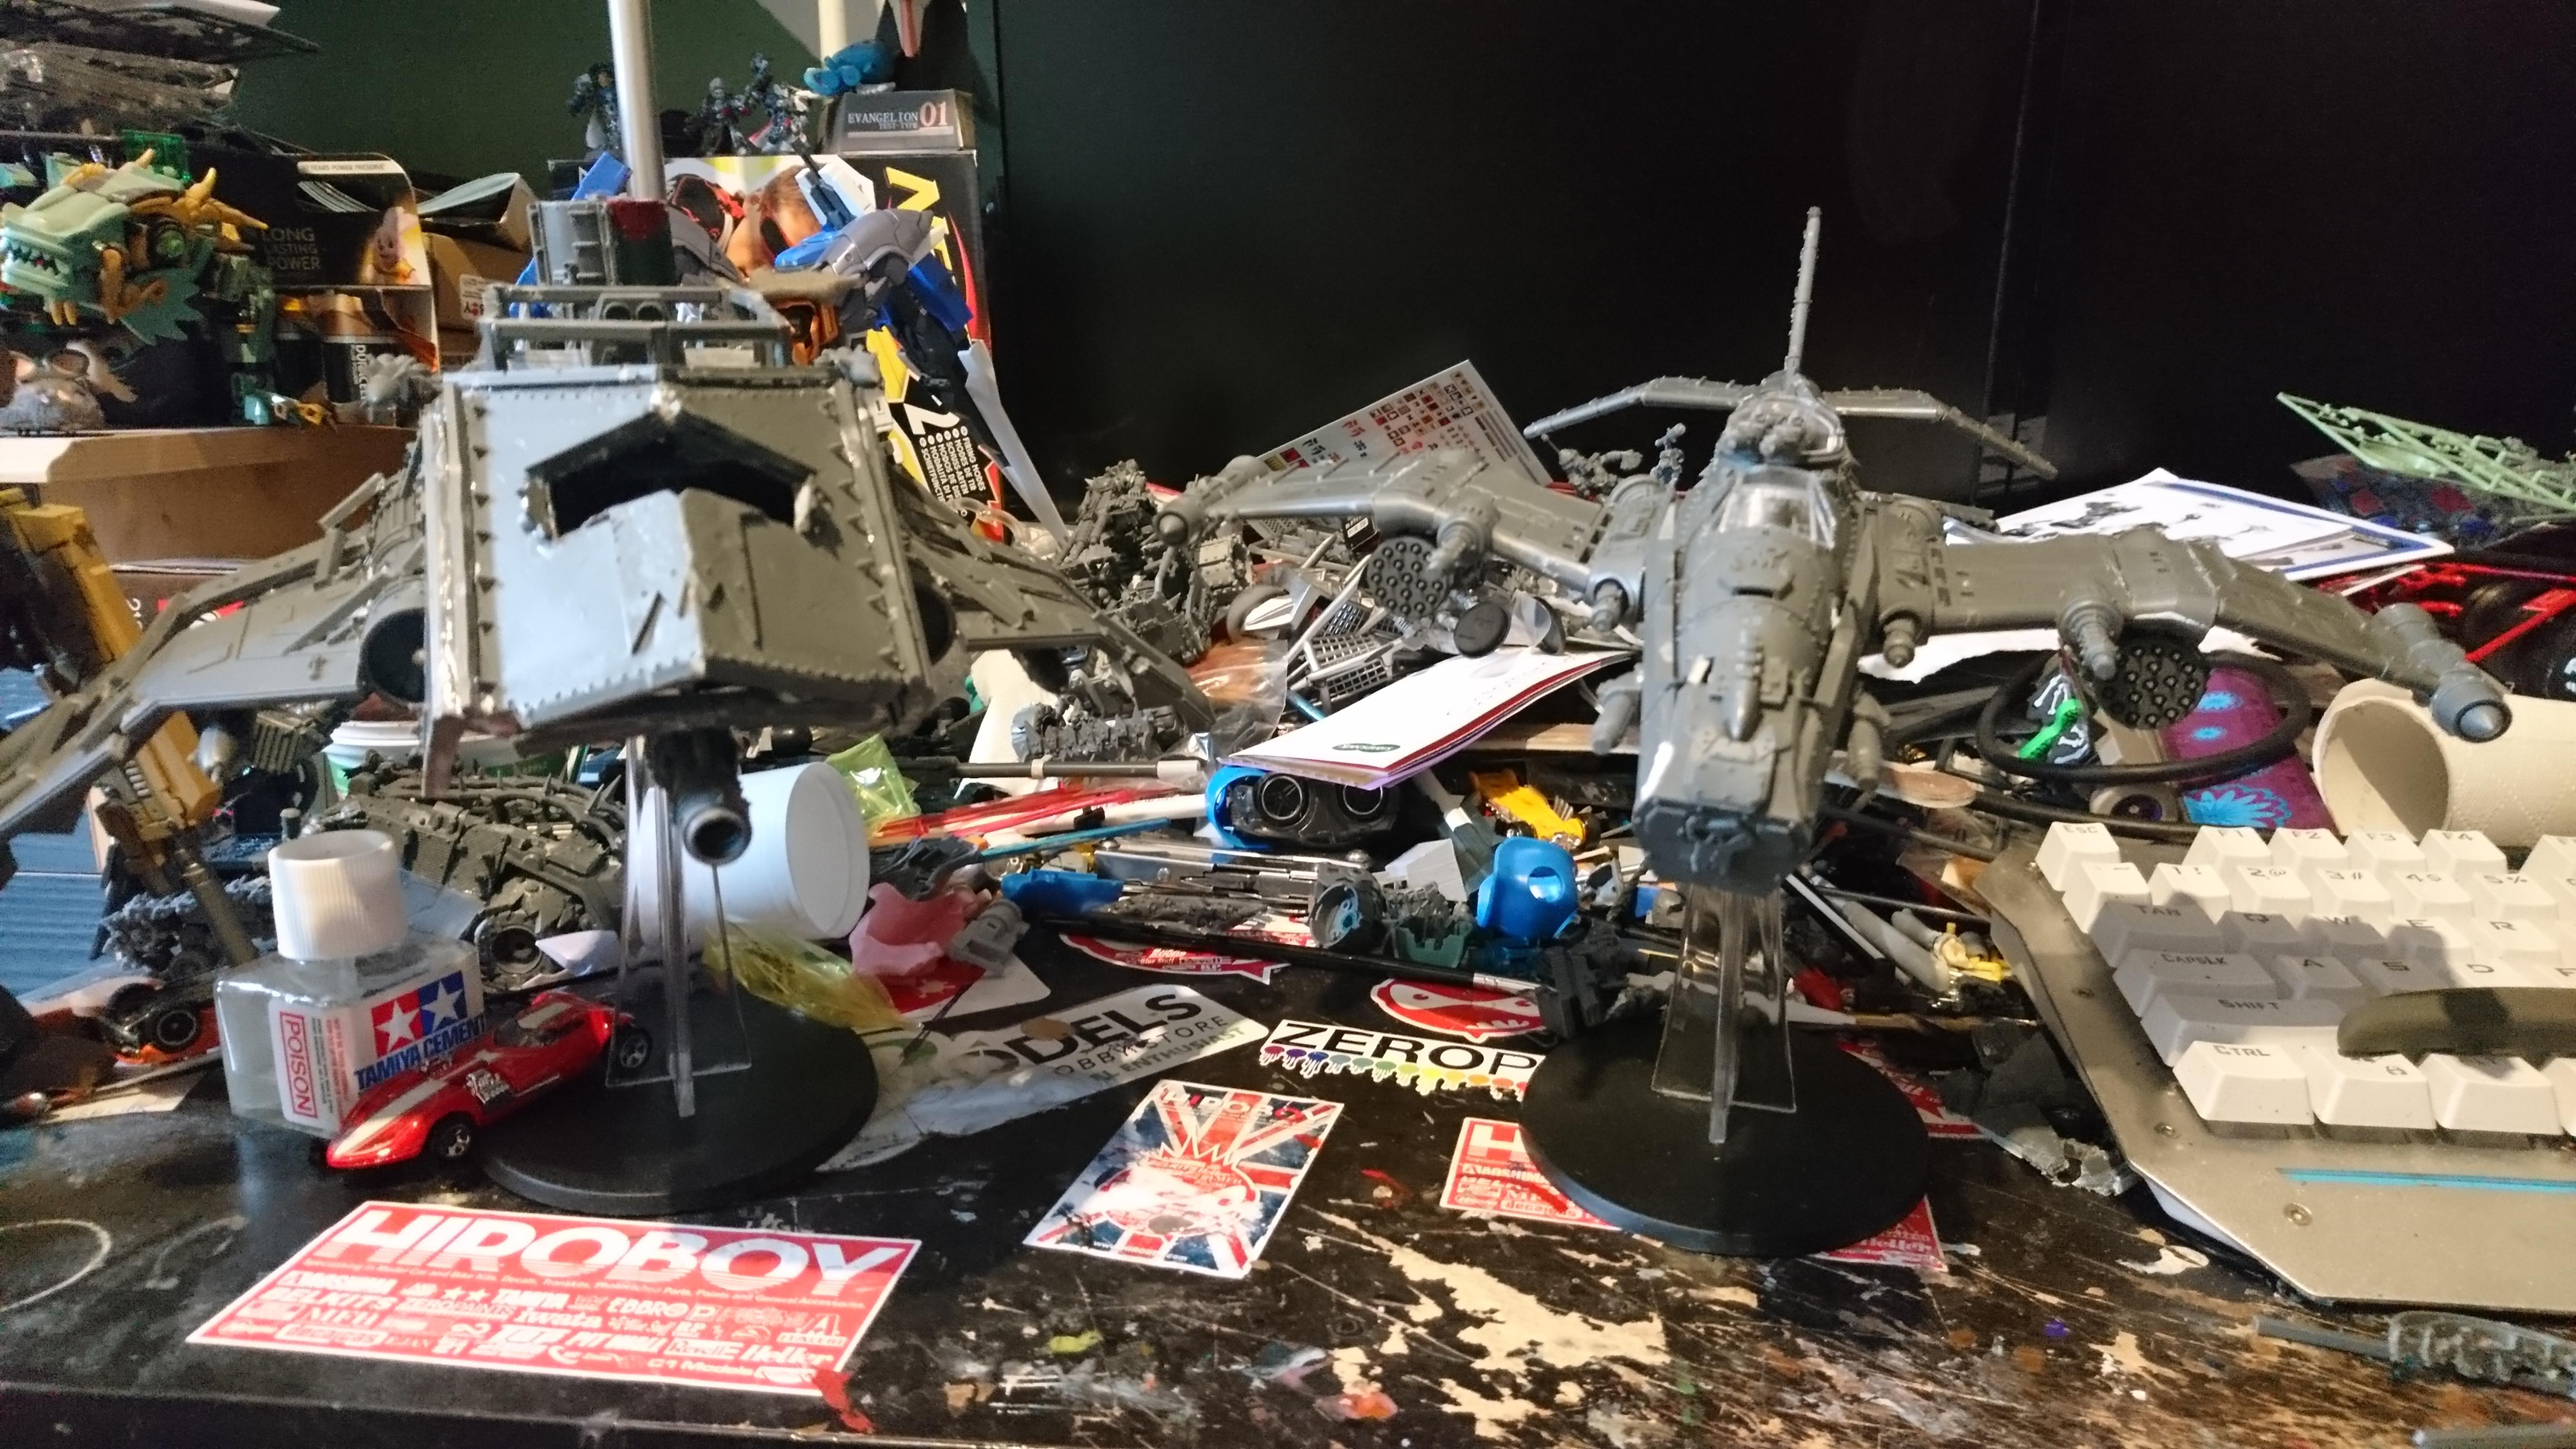 Bomber, Conversion, Dakka Dakka, Dakka Jet, Jet, Kink, Kitbash, Orks, Warhammer 40,000, Warhammer Fantasy, Work In Progress